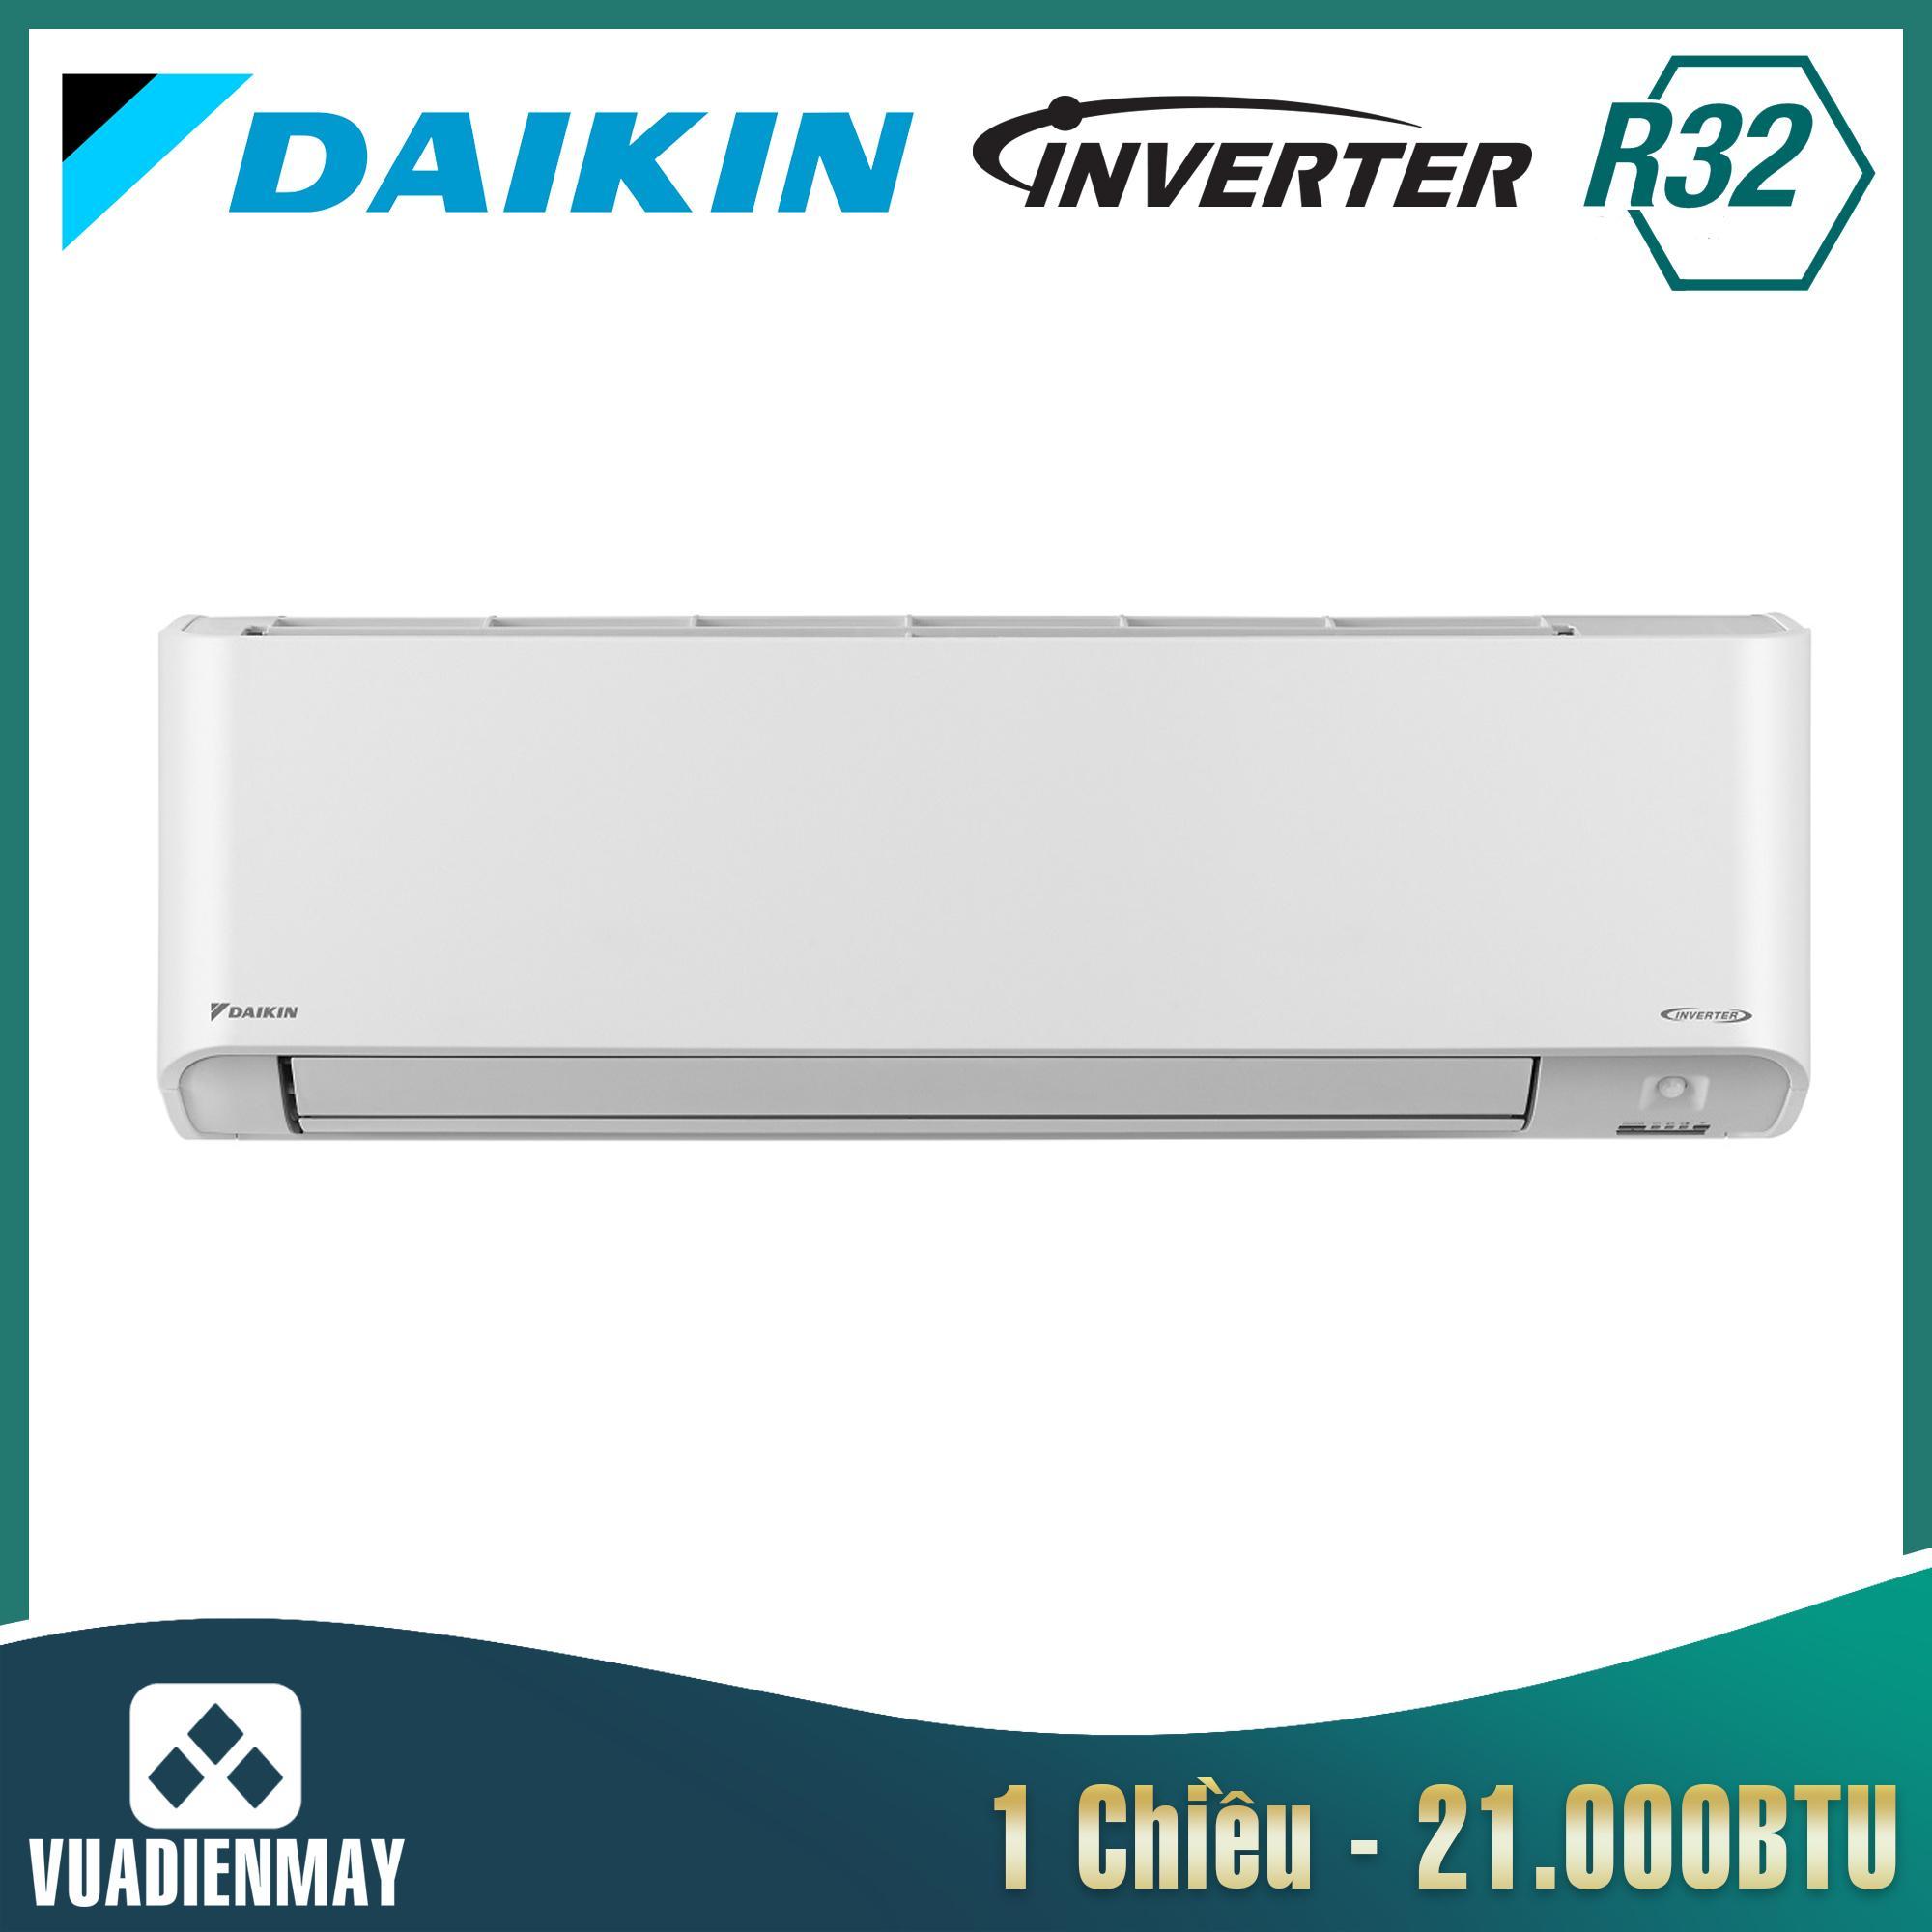 FTKZ60VVMV, Điều hòa Daikin 21000BTU 2 chiều inverter